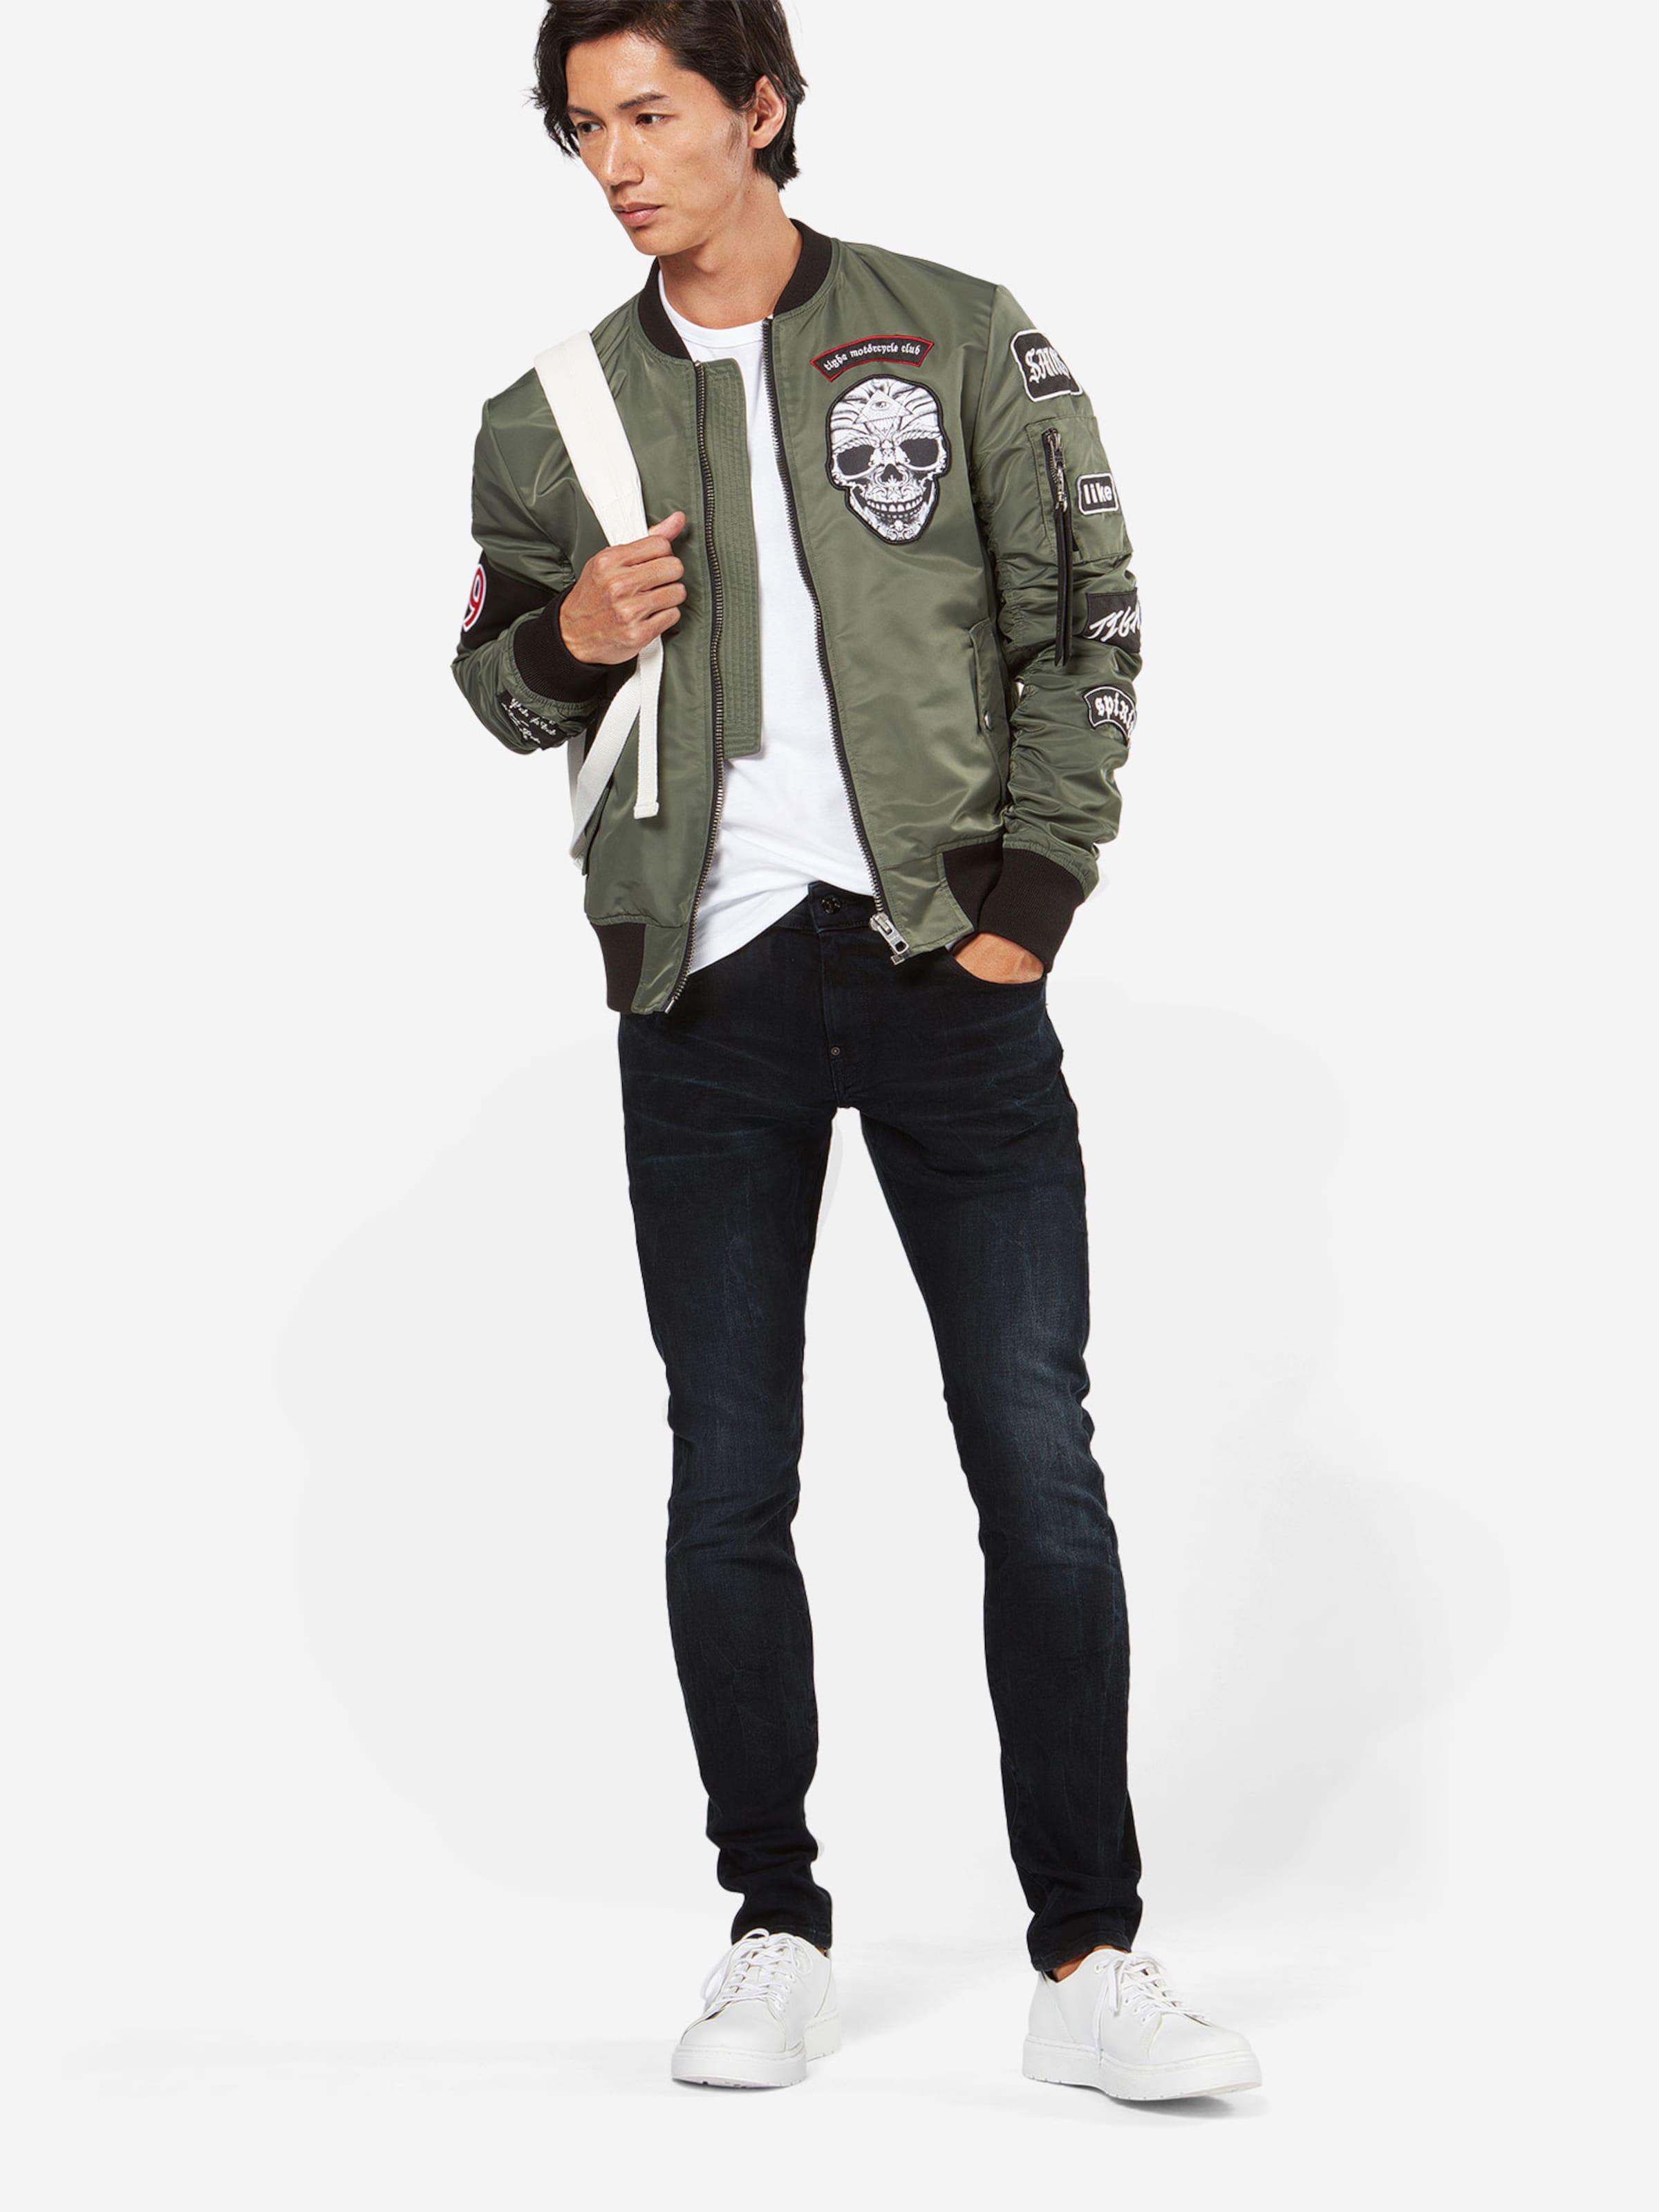 Raw Slim' G star Jeans In Denim Super 'revend Black reCxdBoW